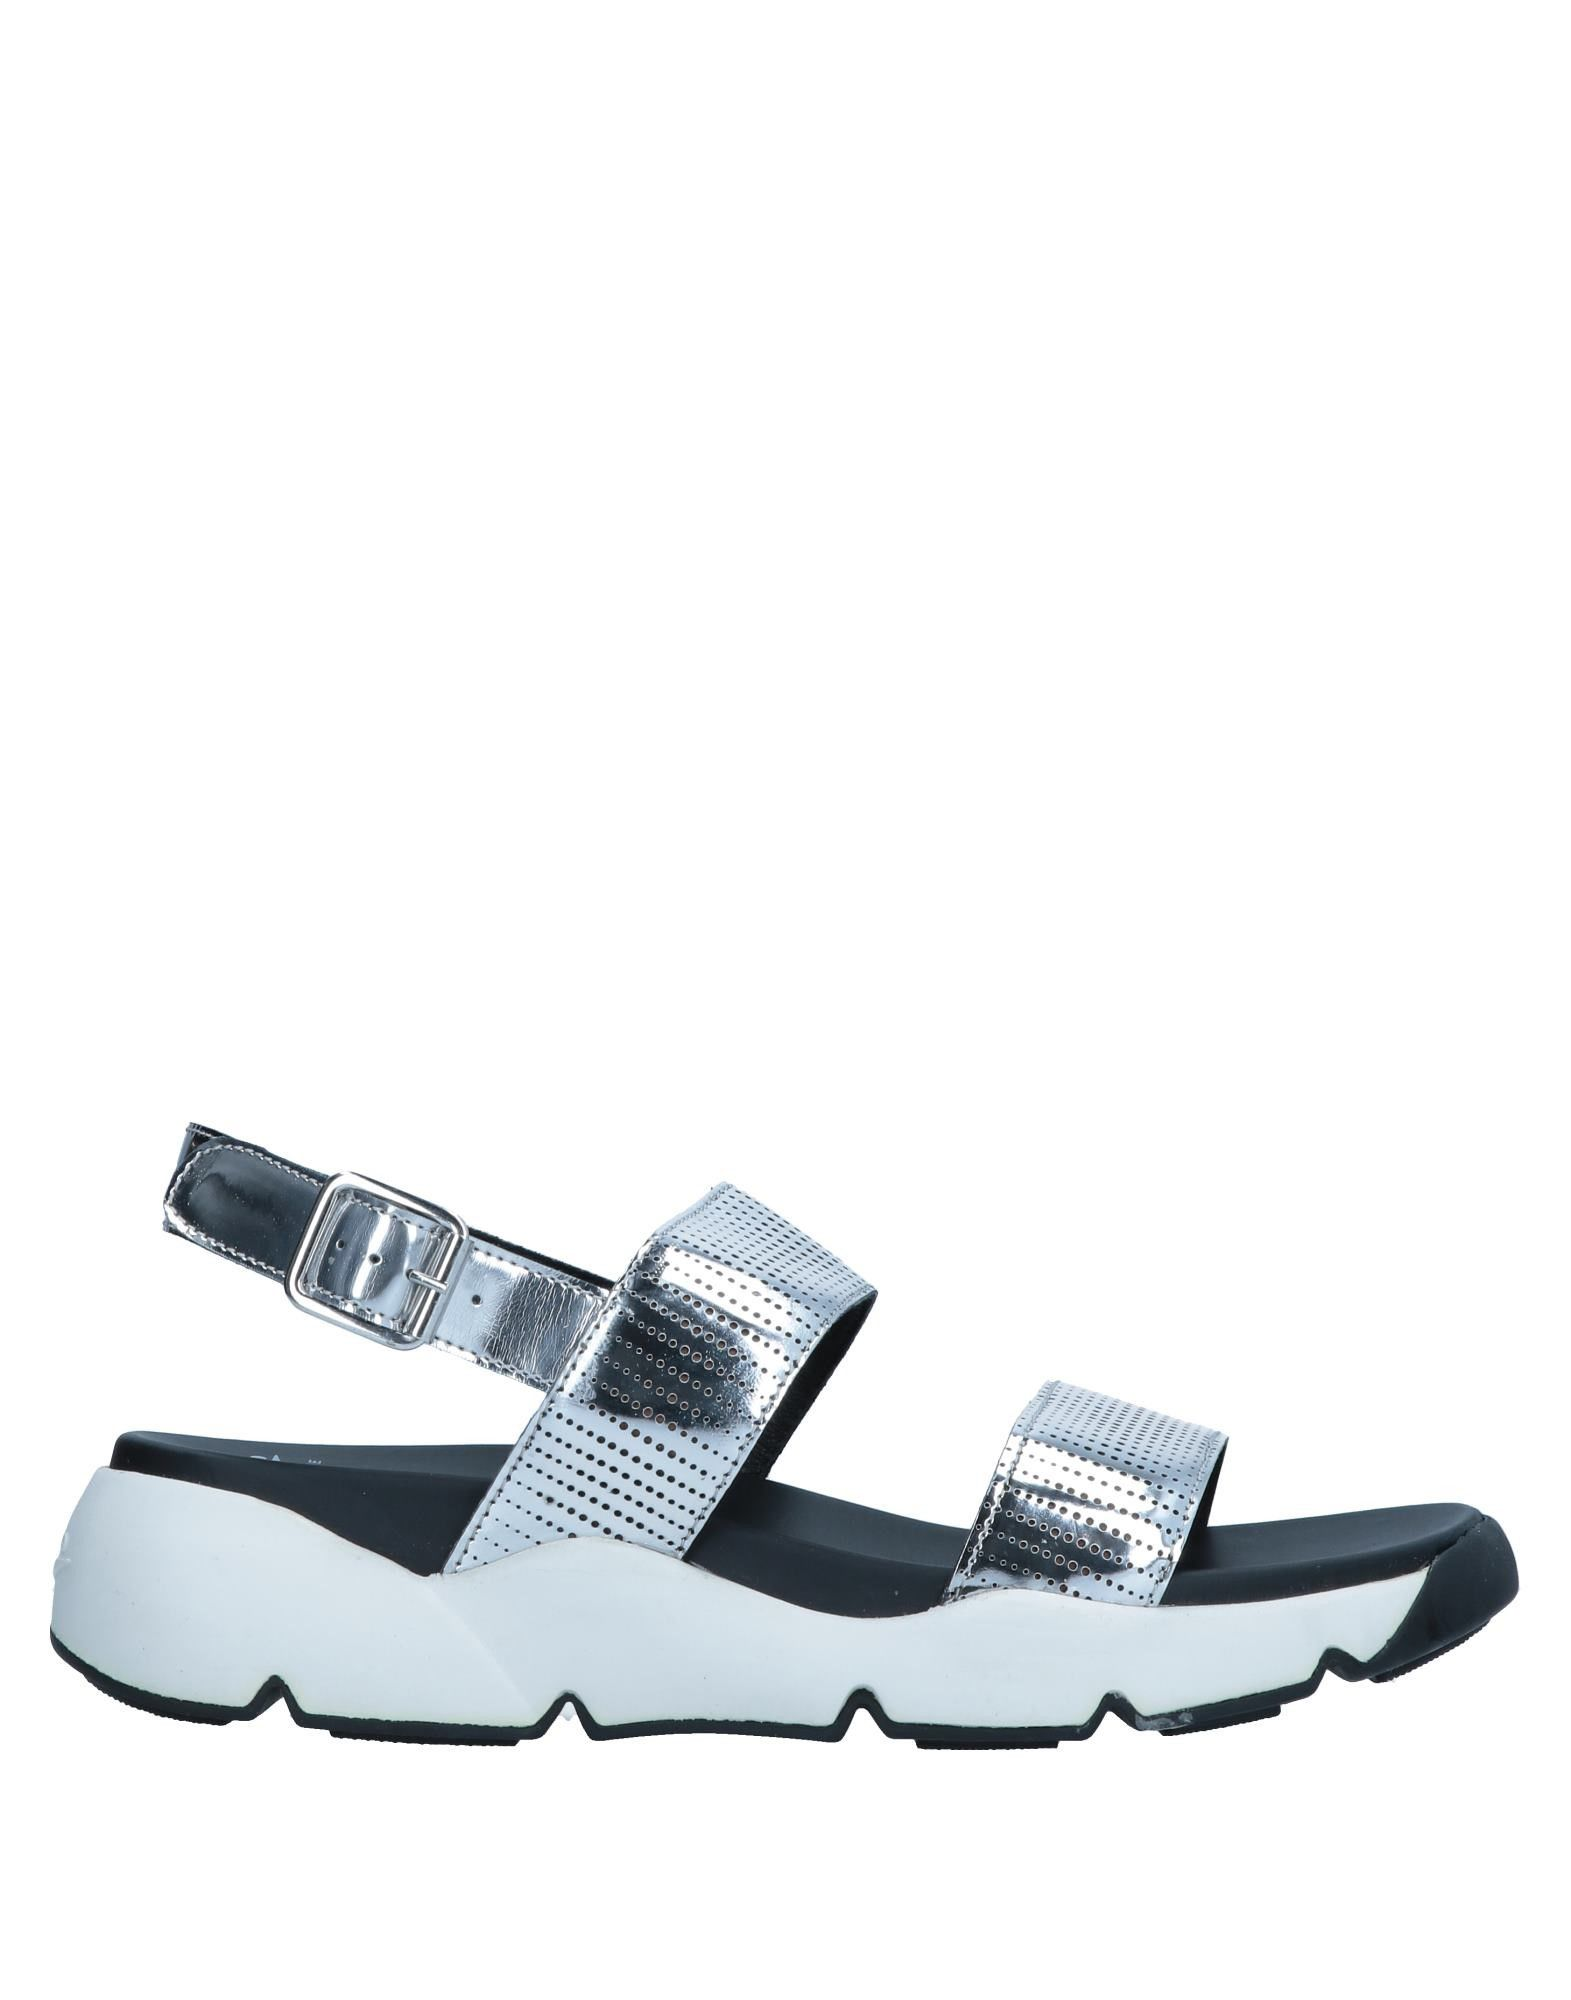 Voile Blanche Sandalen Damen  11545608KE Gute Qualität beliebte Schuhe